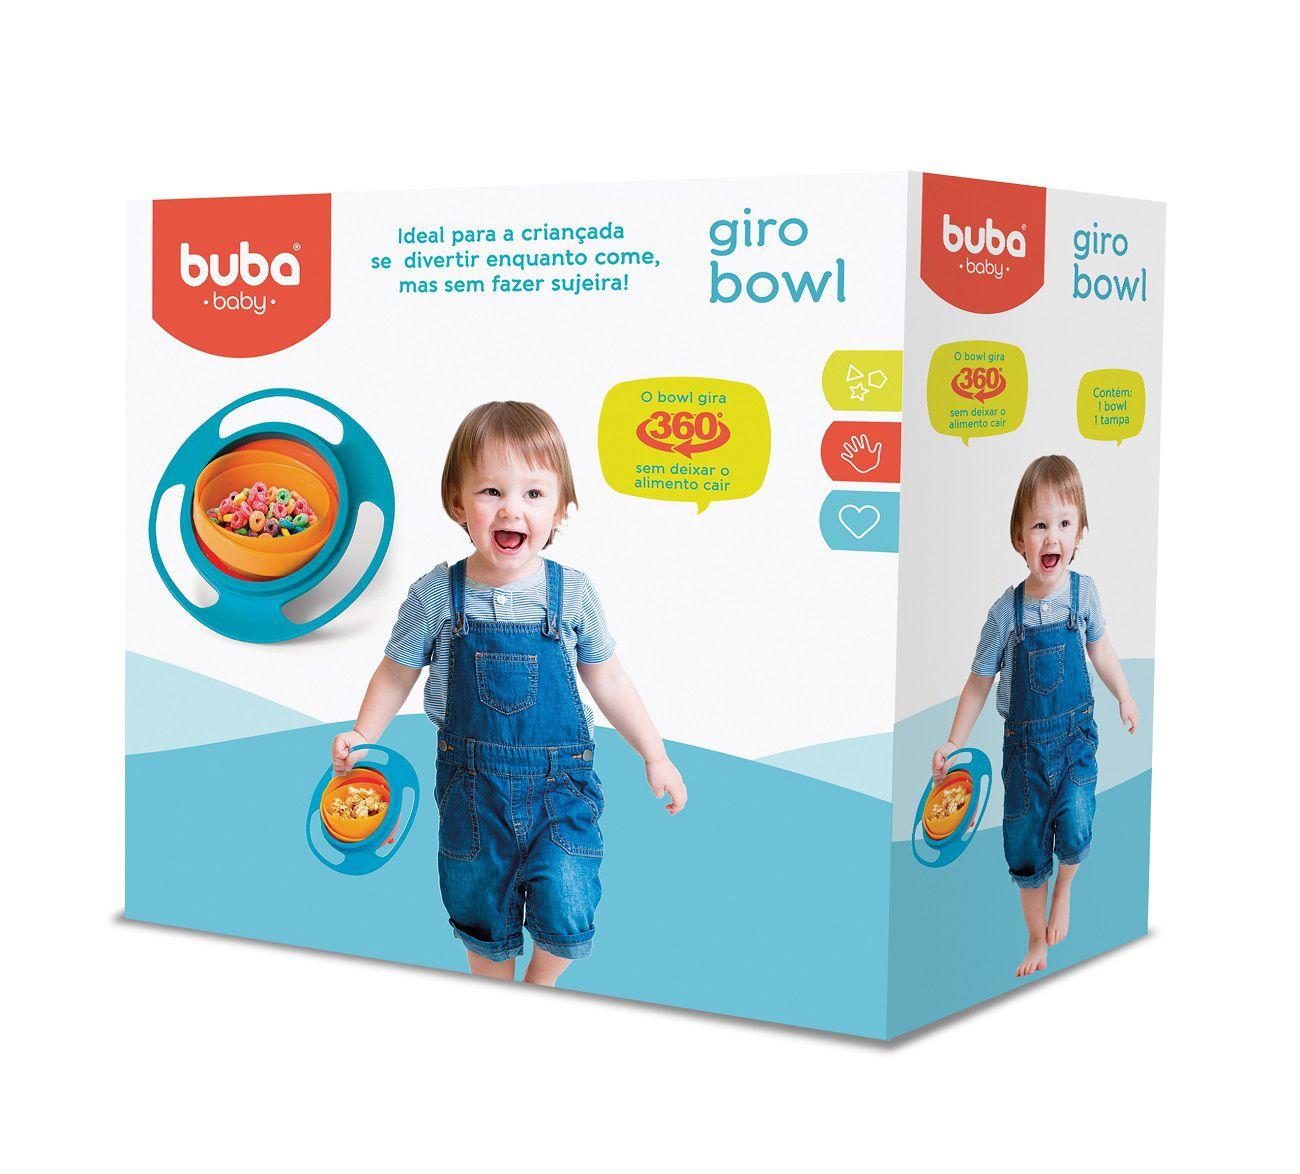 Prato Mágico Giratório Gira Bowl Infantil - Buba Baby